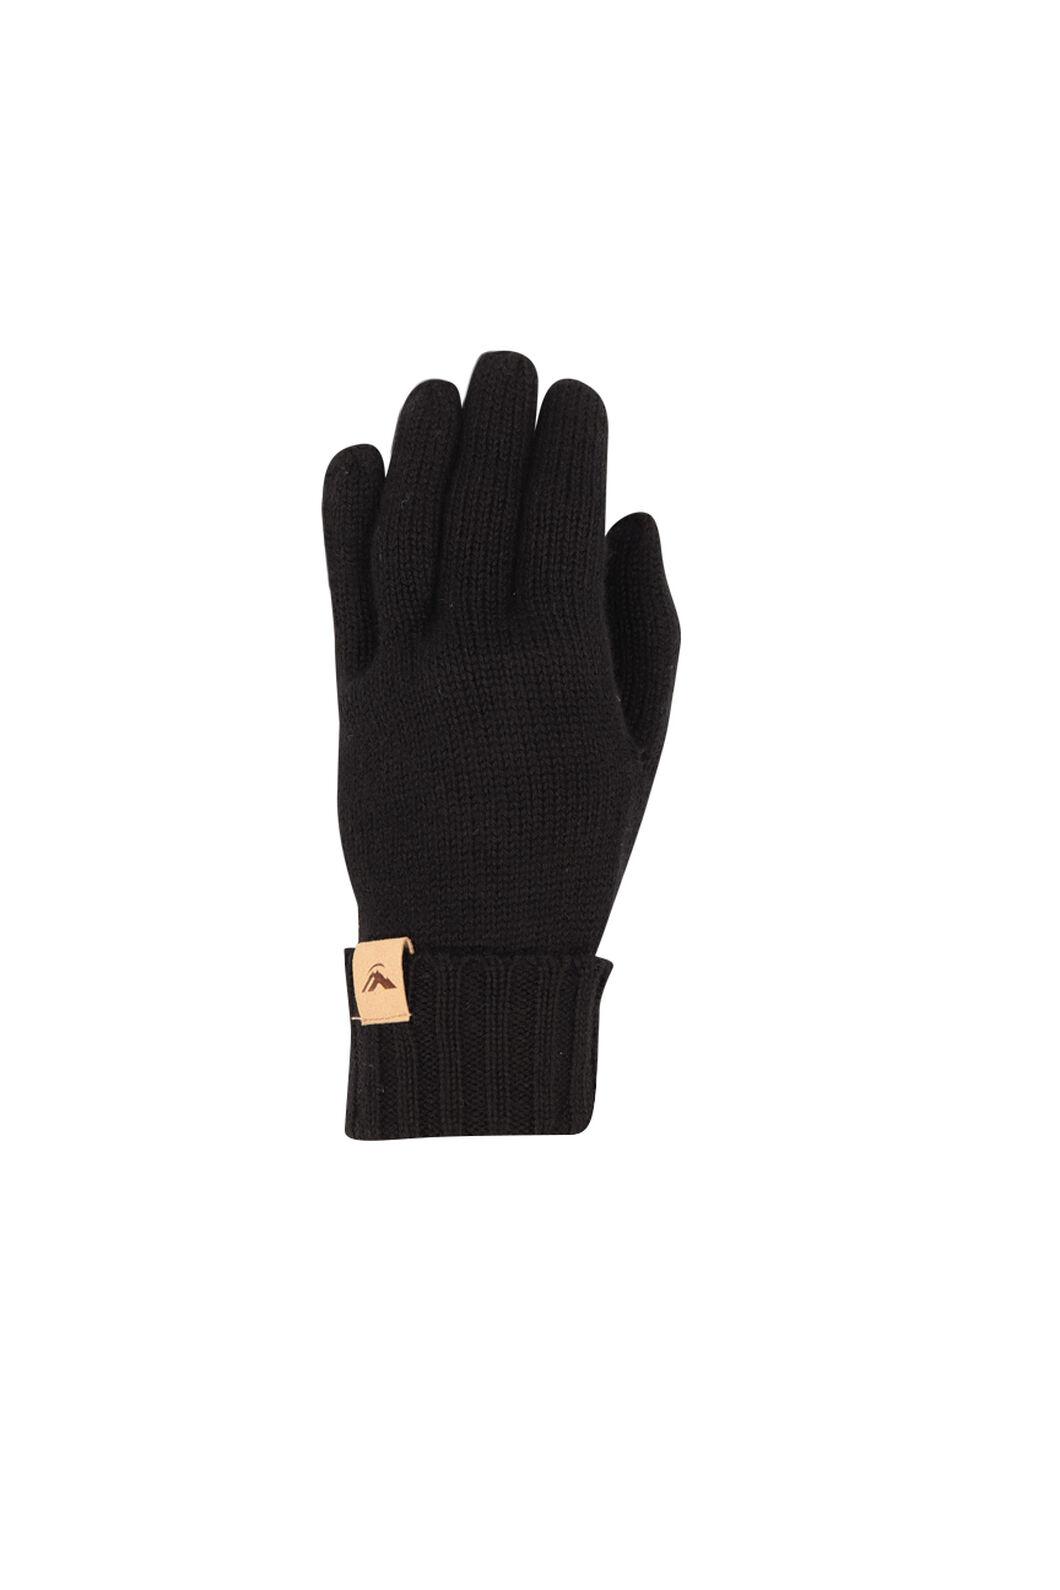 Macpac Merino Knit Gloves V2, Black, hi-res